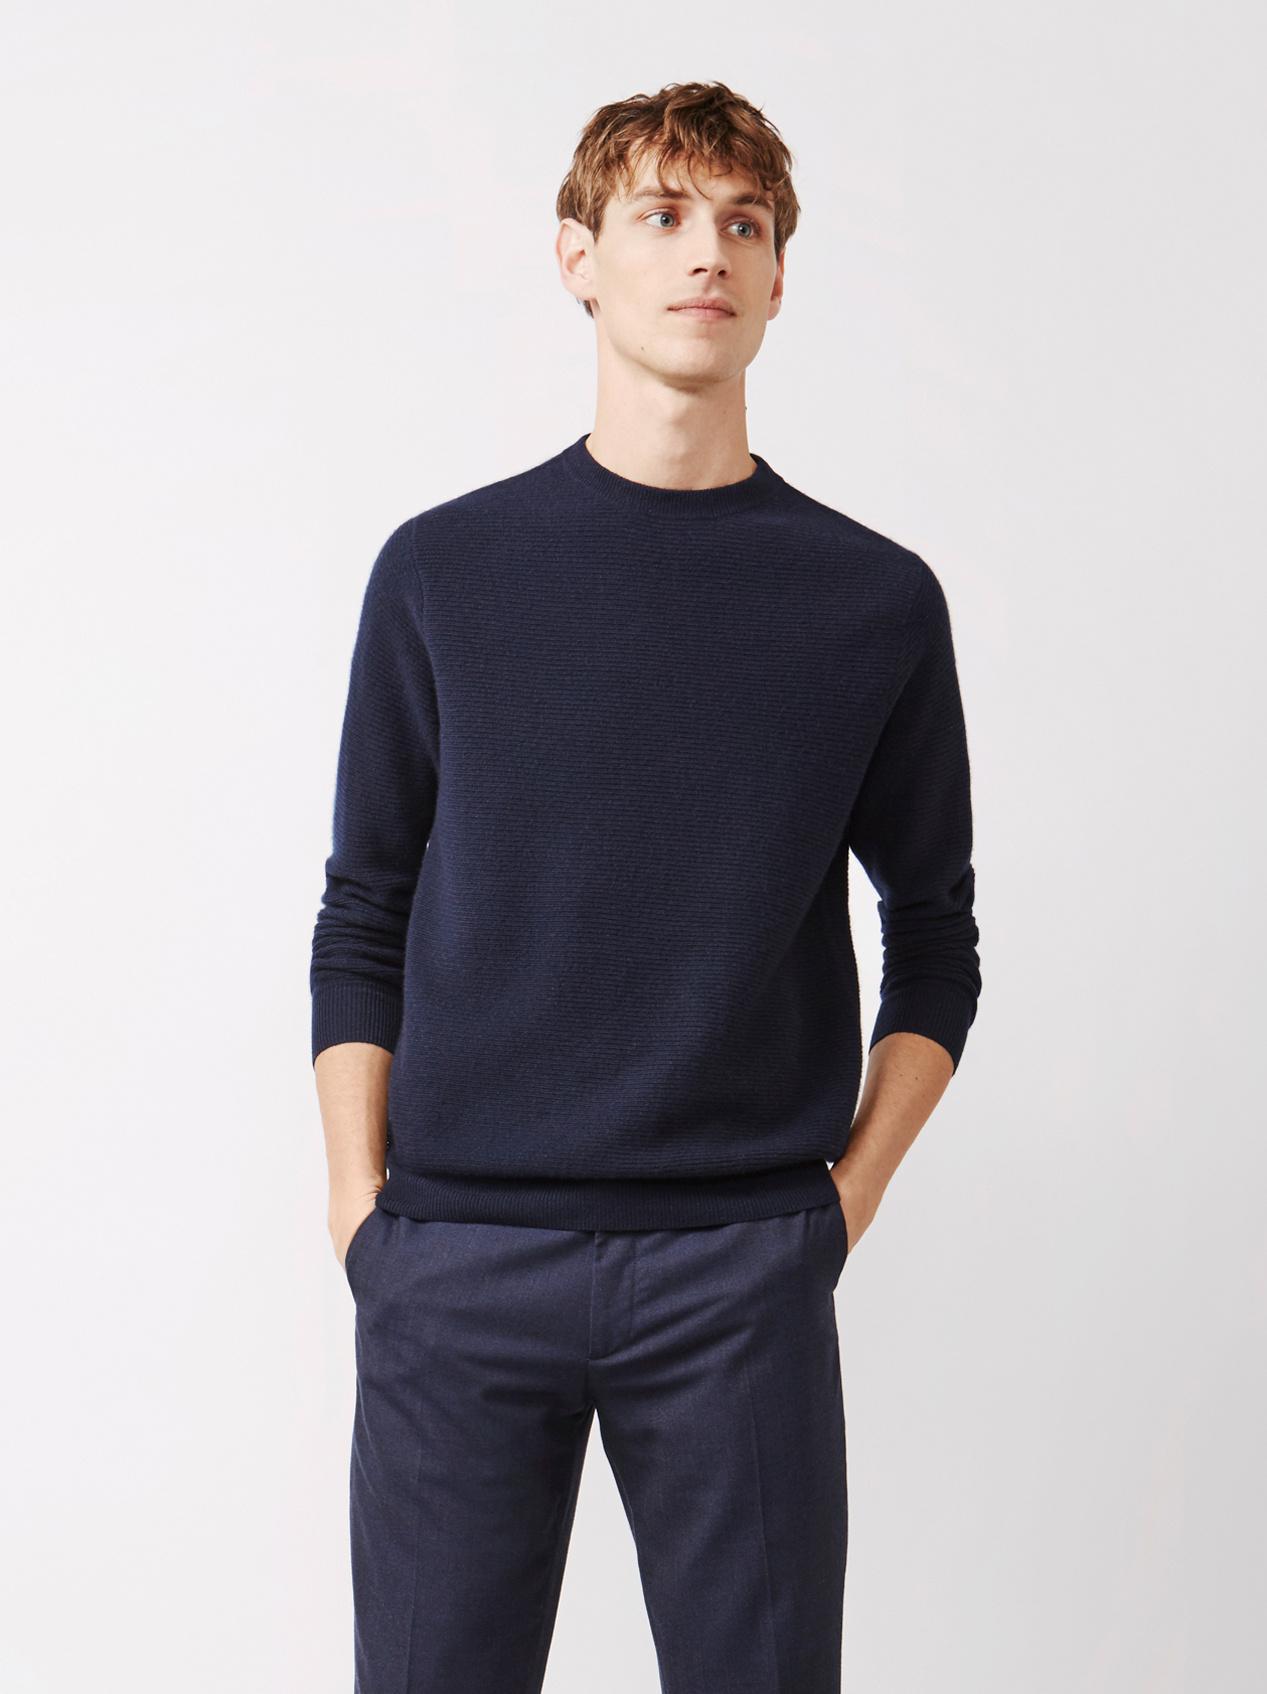 Soft Goat Men's Ribbed Sweater Navy